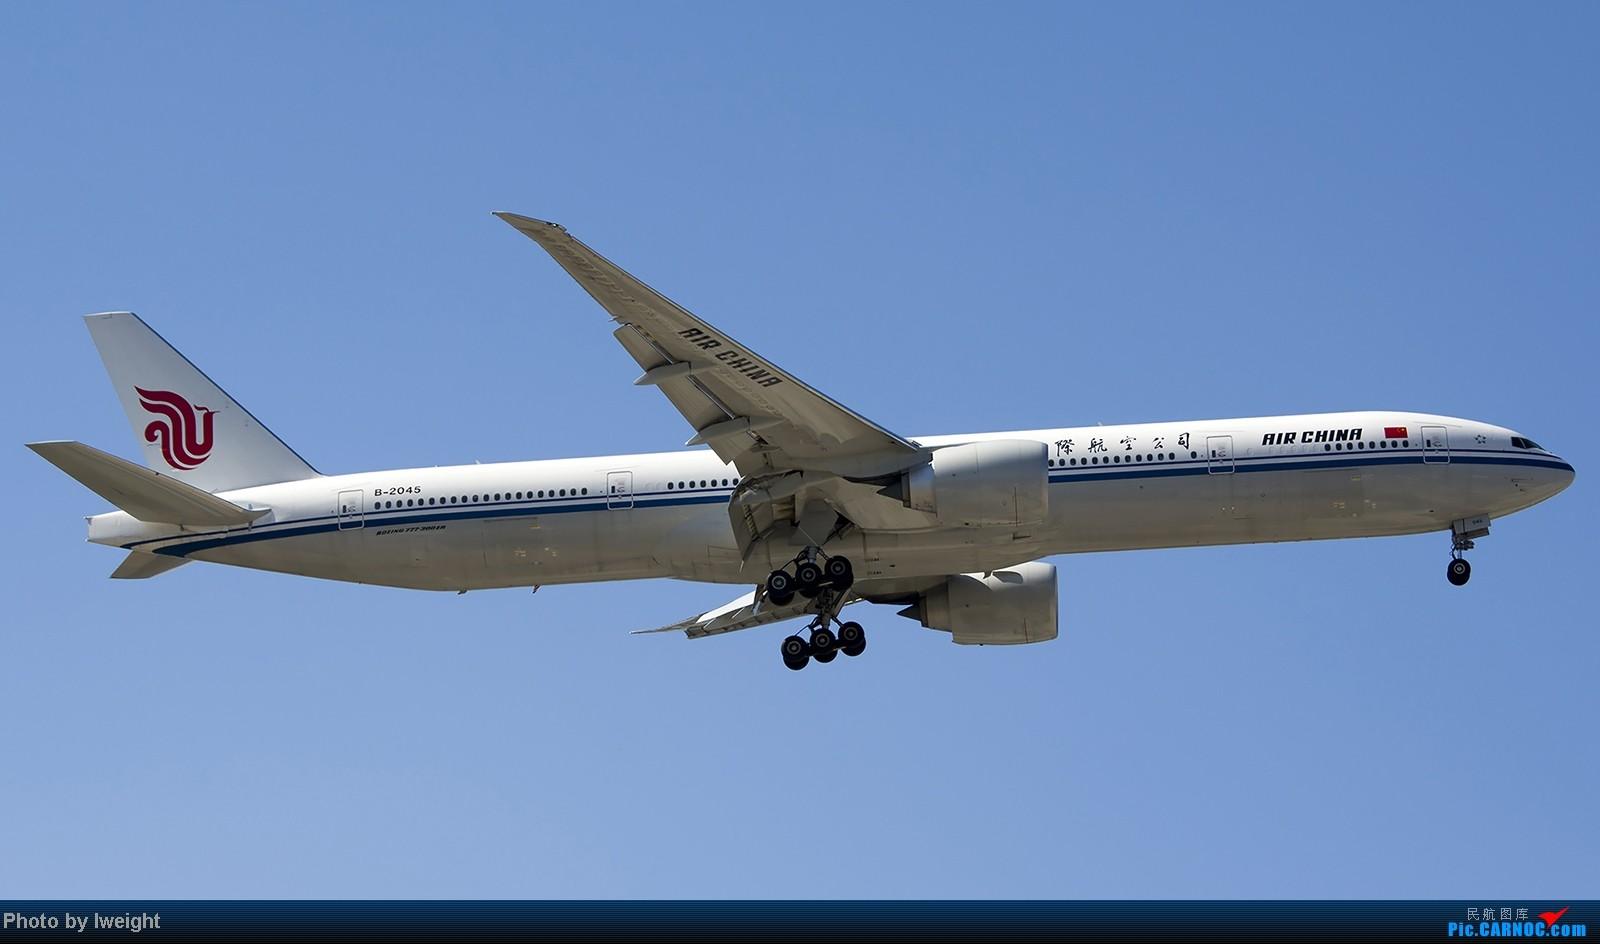 Re:[原创]难得赶上PEK周末好天气,各种常见机型都有收获 BOEING 777-300ER B-2045 中国北京首都机场